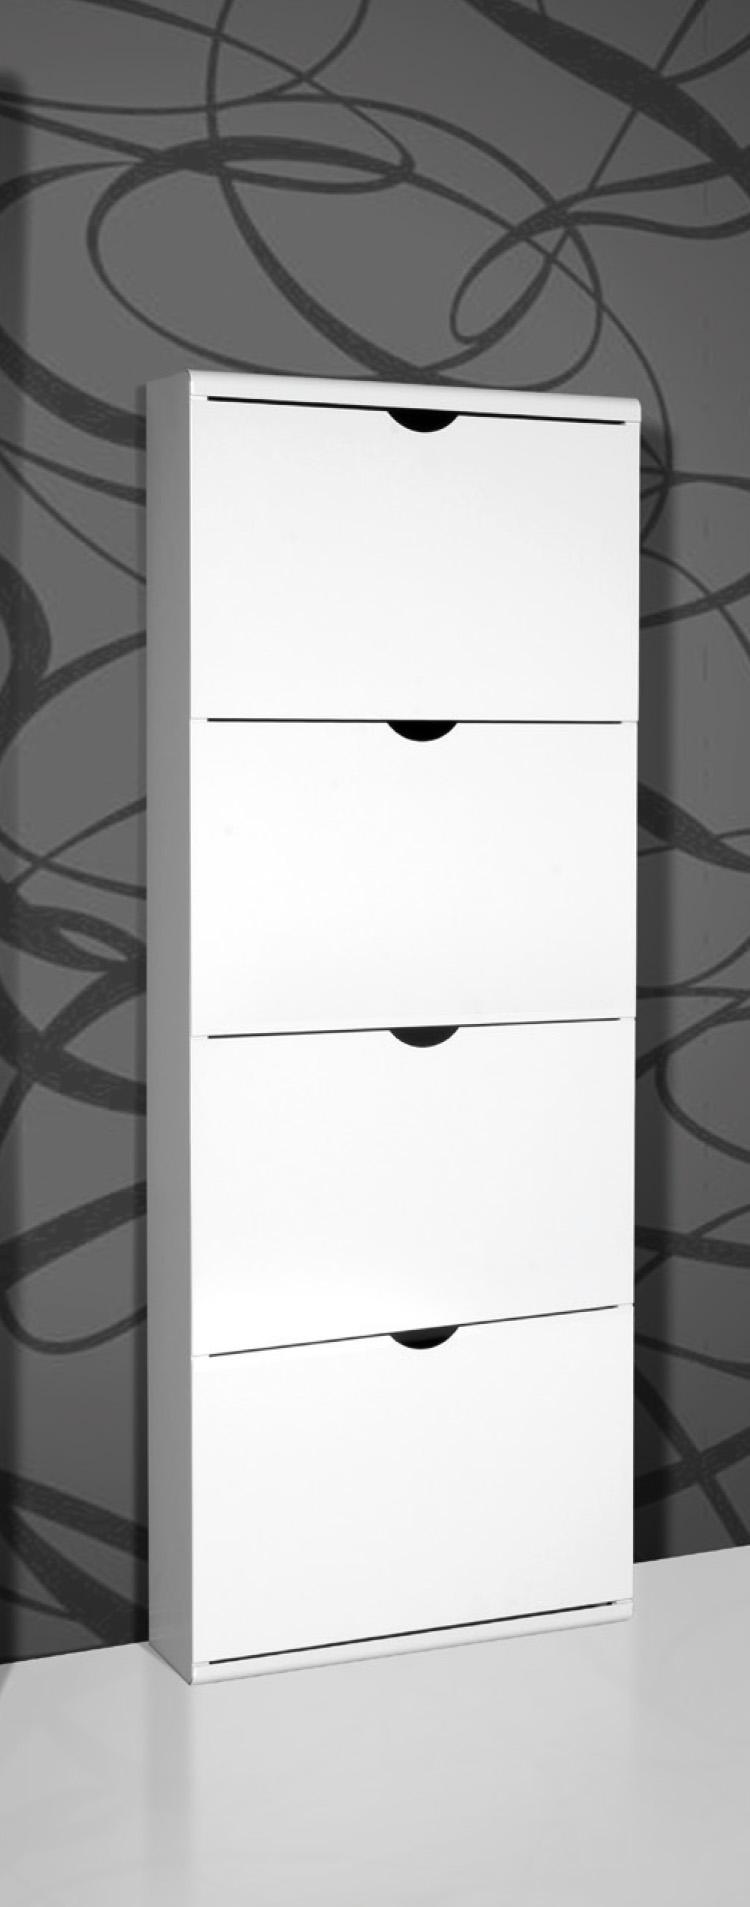 Porte Chaussure Derriere Porte bien choisir son meubles range chaussure